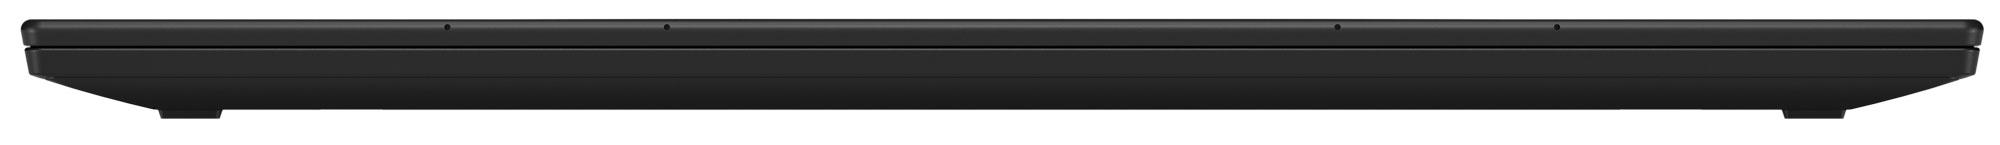 Фото  Ультрабук ThinkPad X1 Carbon 7th Gen (20QD003DRT)